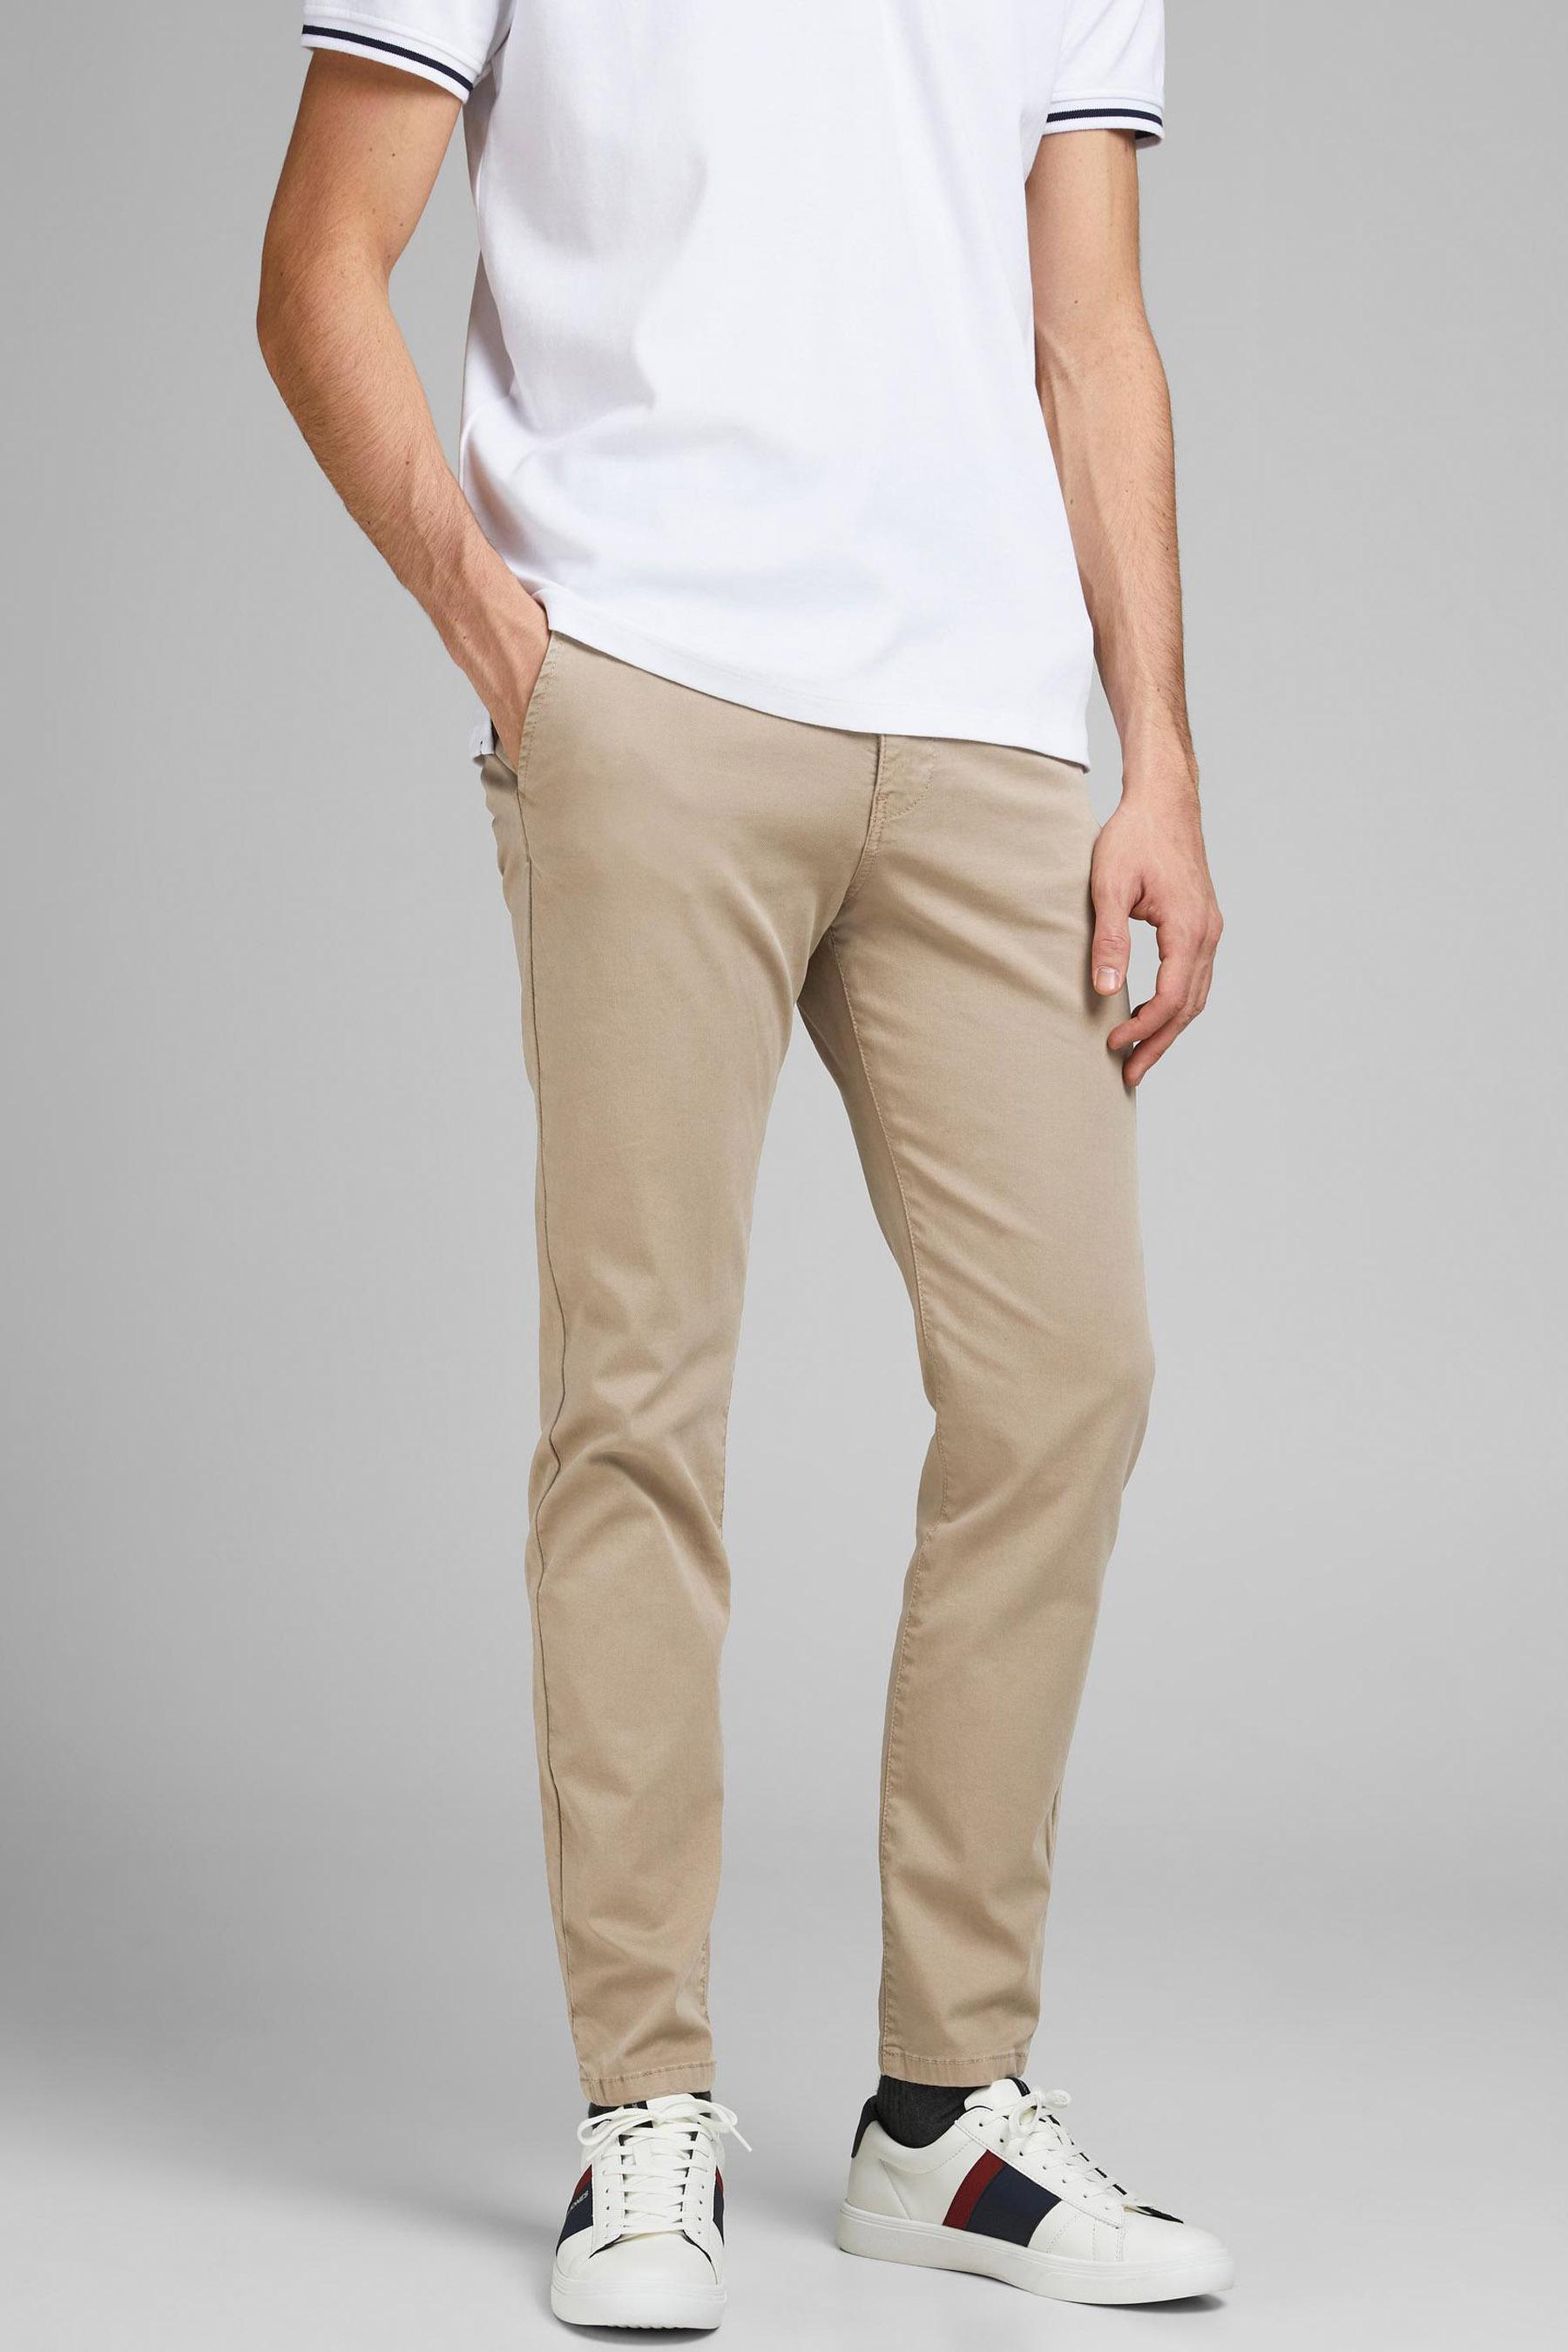 Jack & Jones Jeans Intelligence Chino, Wit, Heren, Maat: 27x32/29x32/31x32/32x32